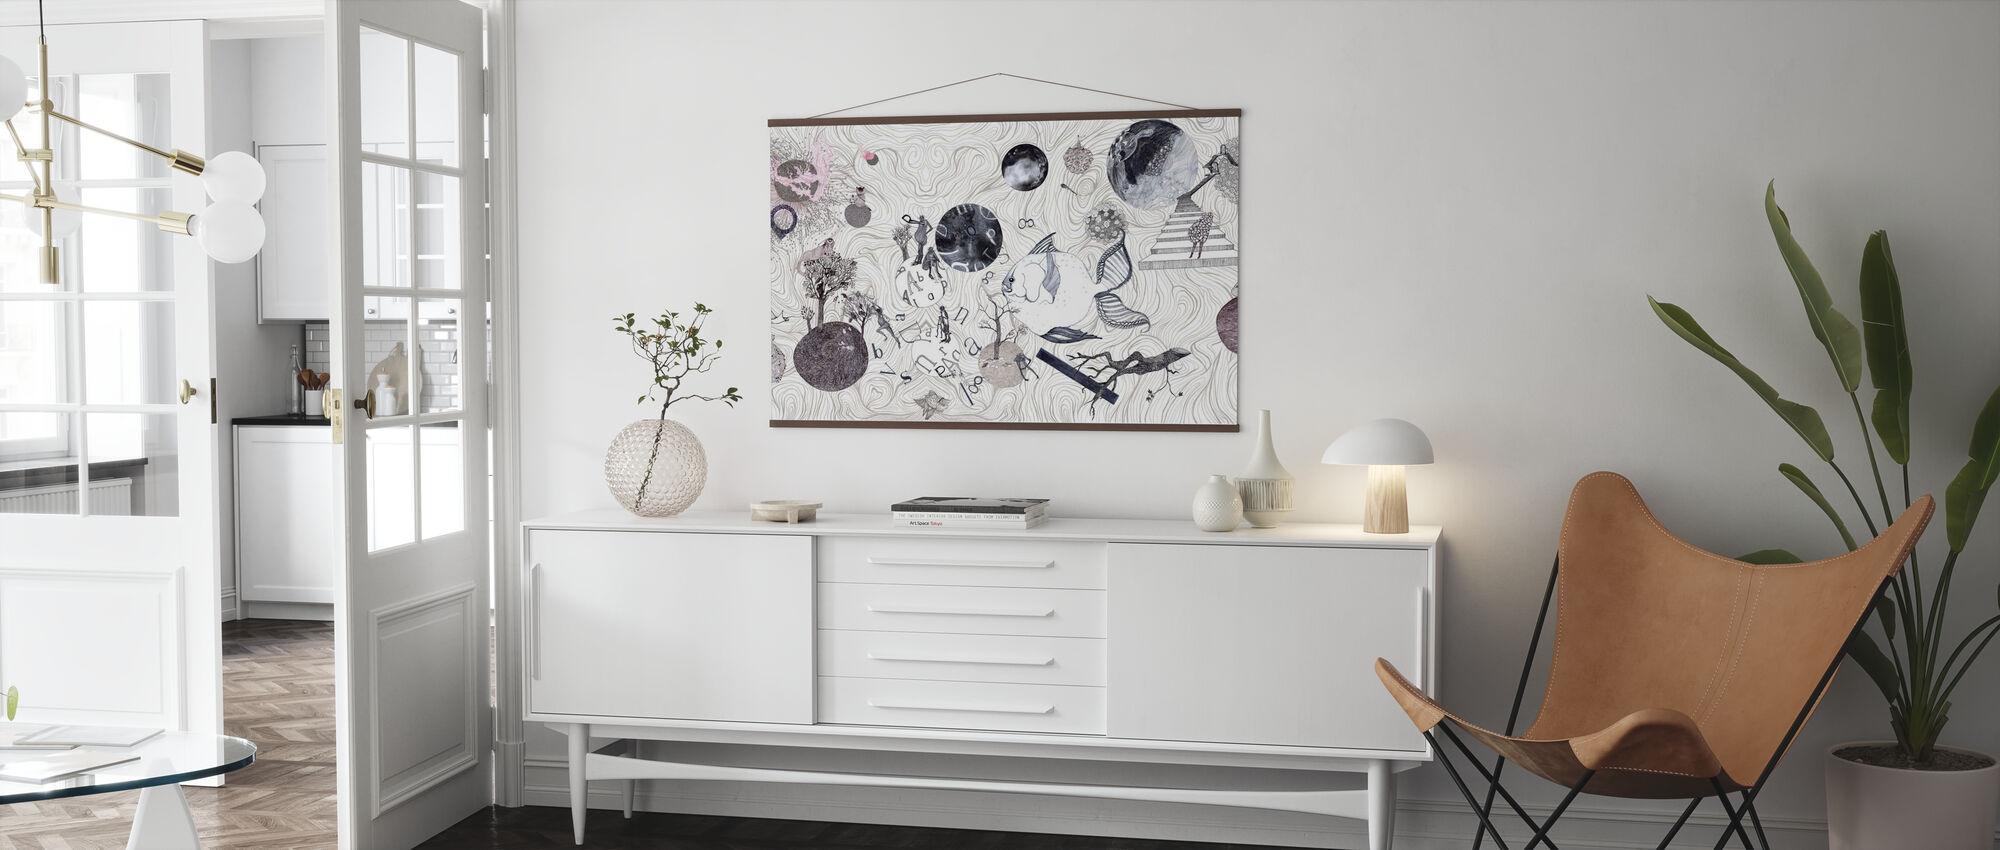 Mundi - Poster - Wohnzimmer